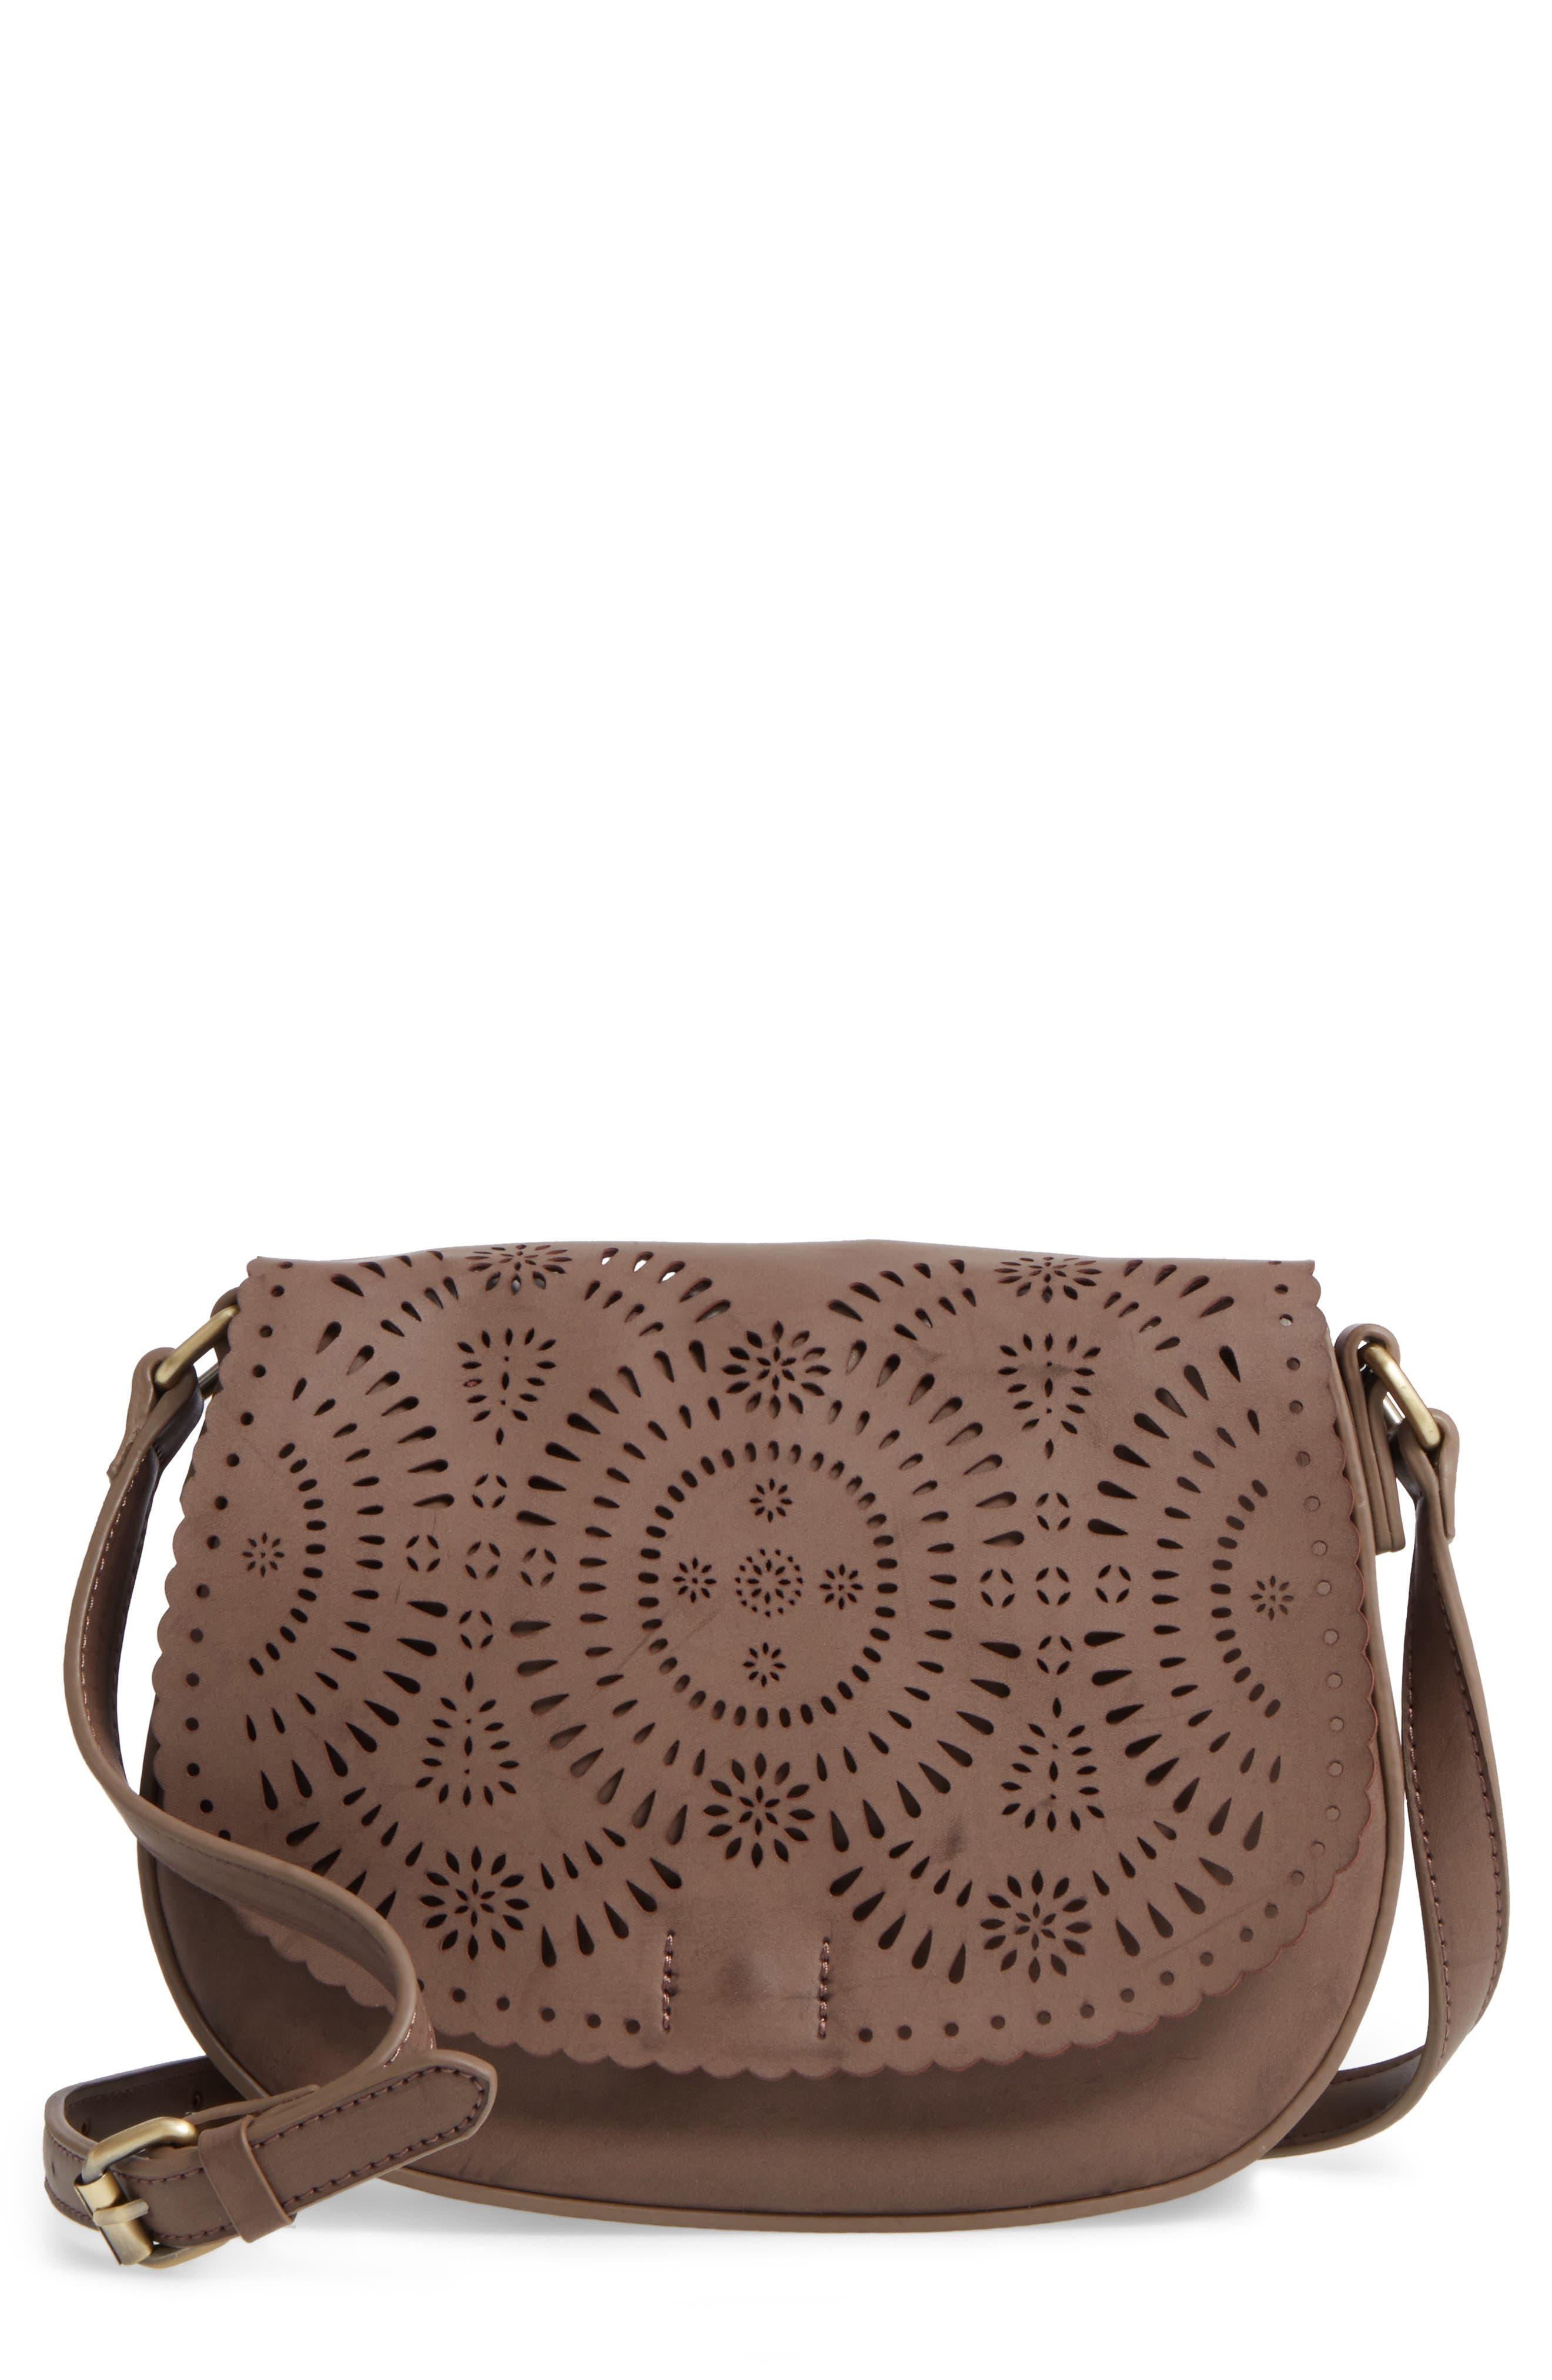 Dakota Faux Leather Saddle Bag,                             Main thumbnail 1, color,                             022